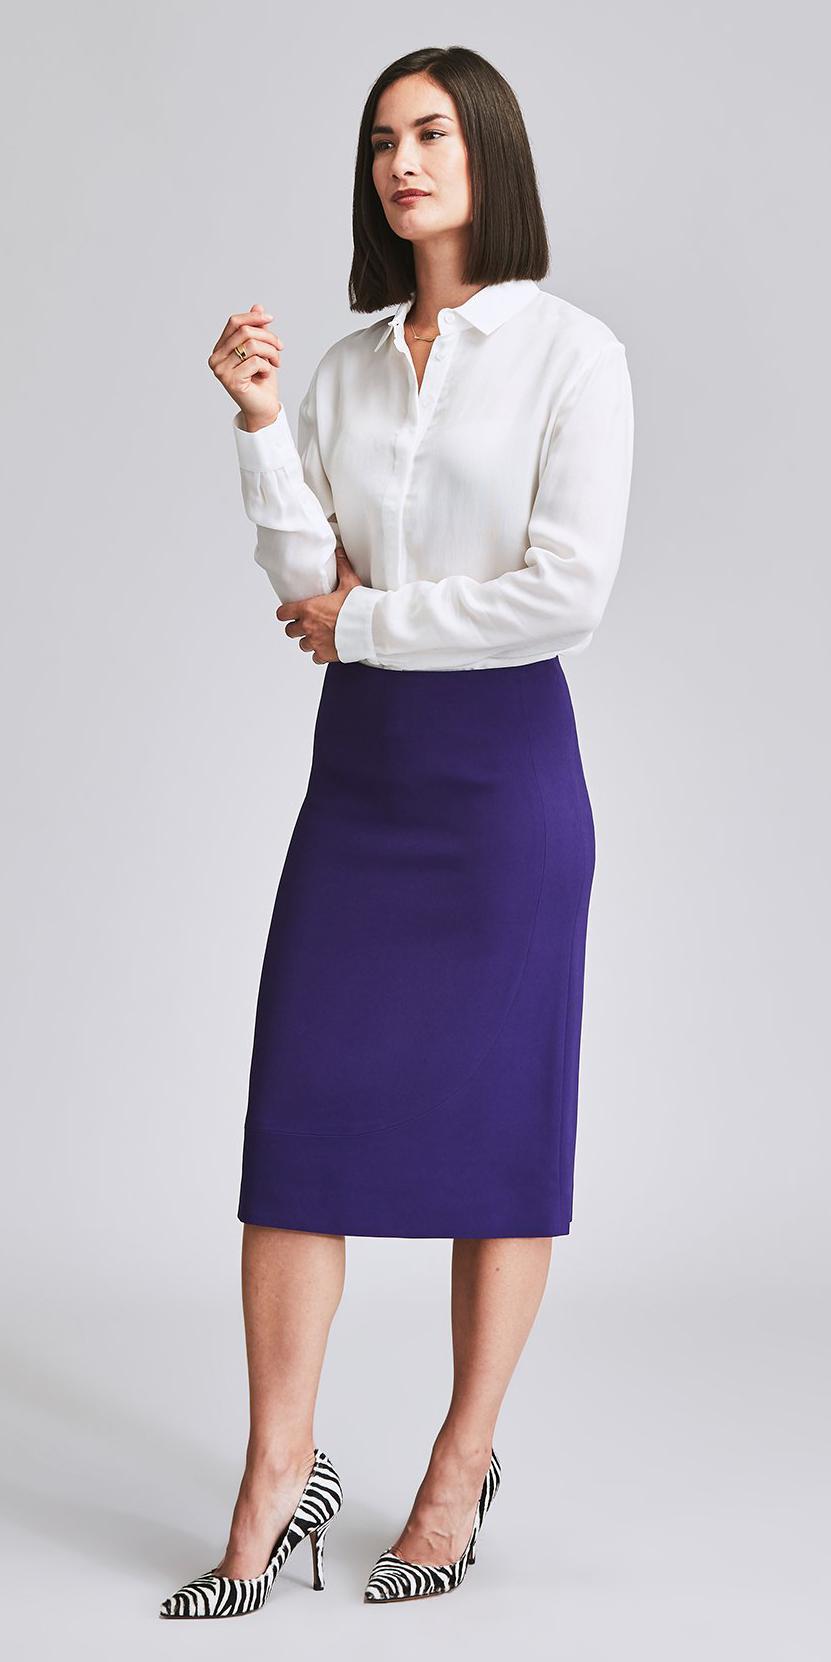 purple-royal-pencil-skirt-white-collared-shirt-white-shoe-pumps-brun-lob-spring-summer-work.jpg